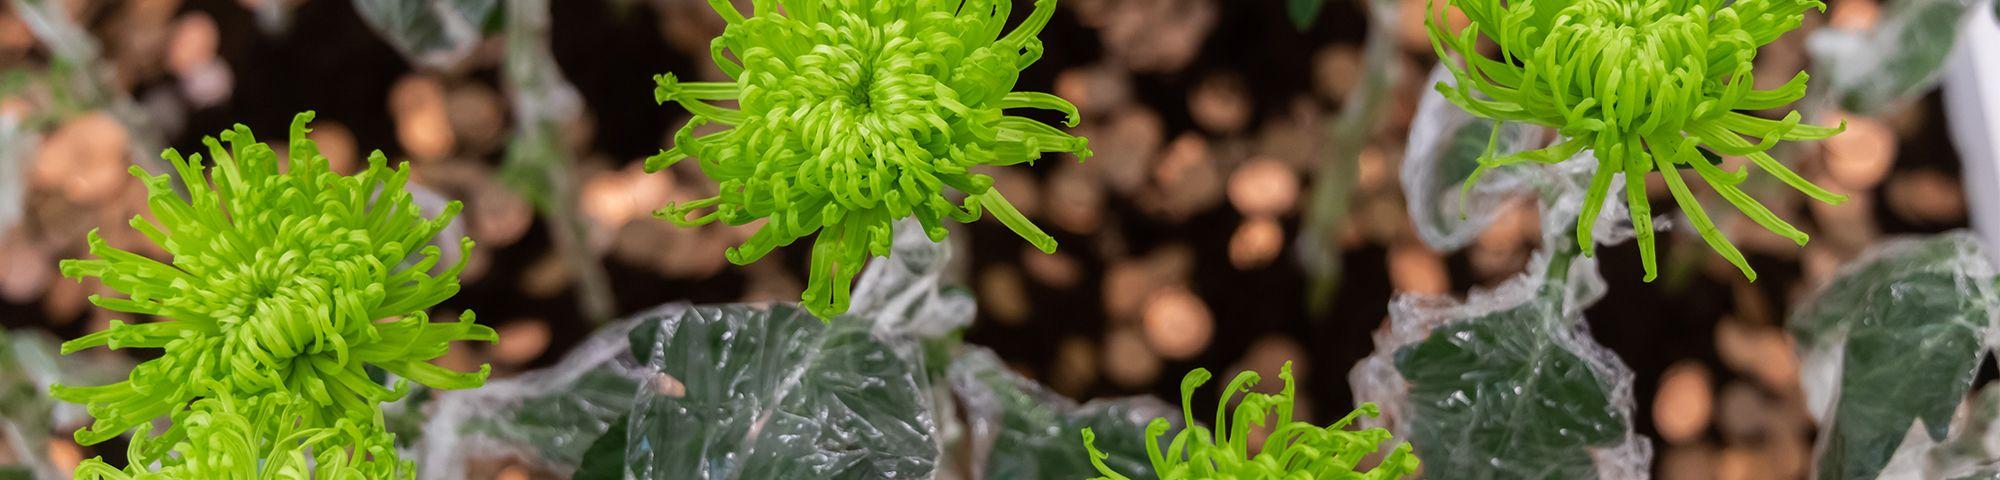 Close up shot of green plants